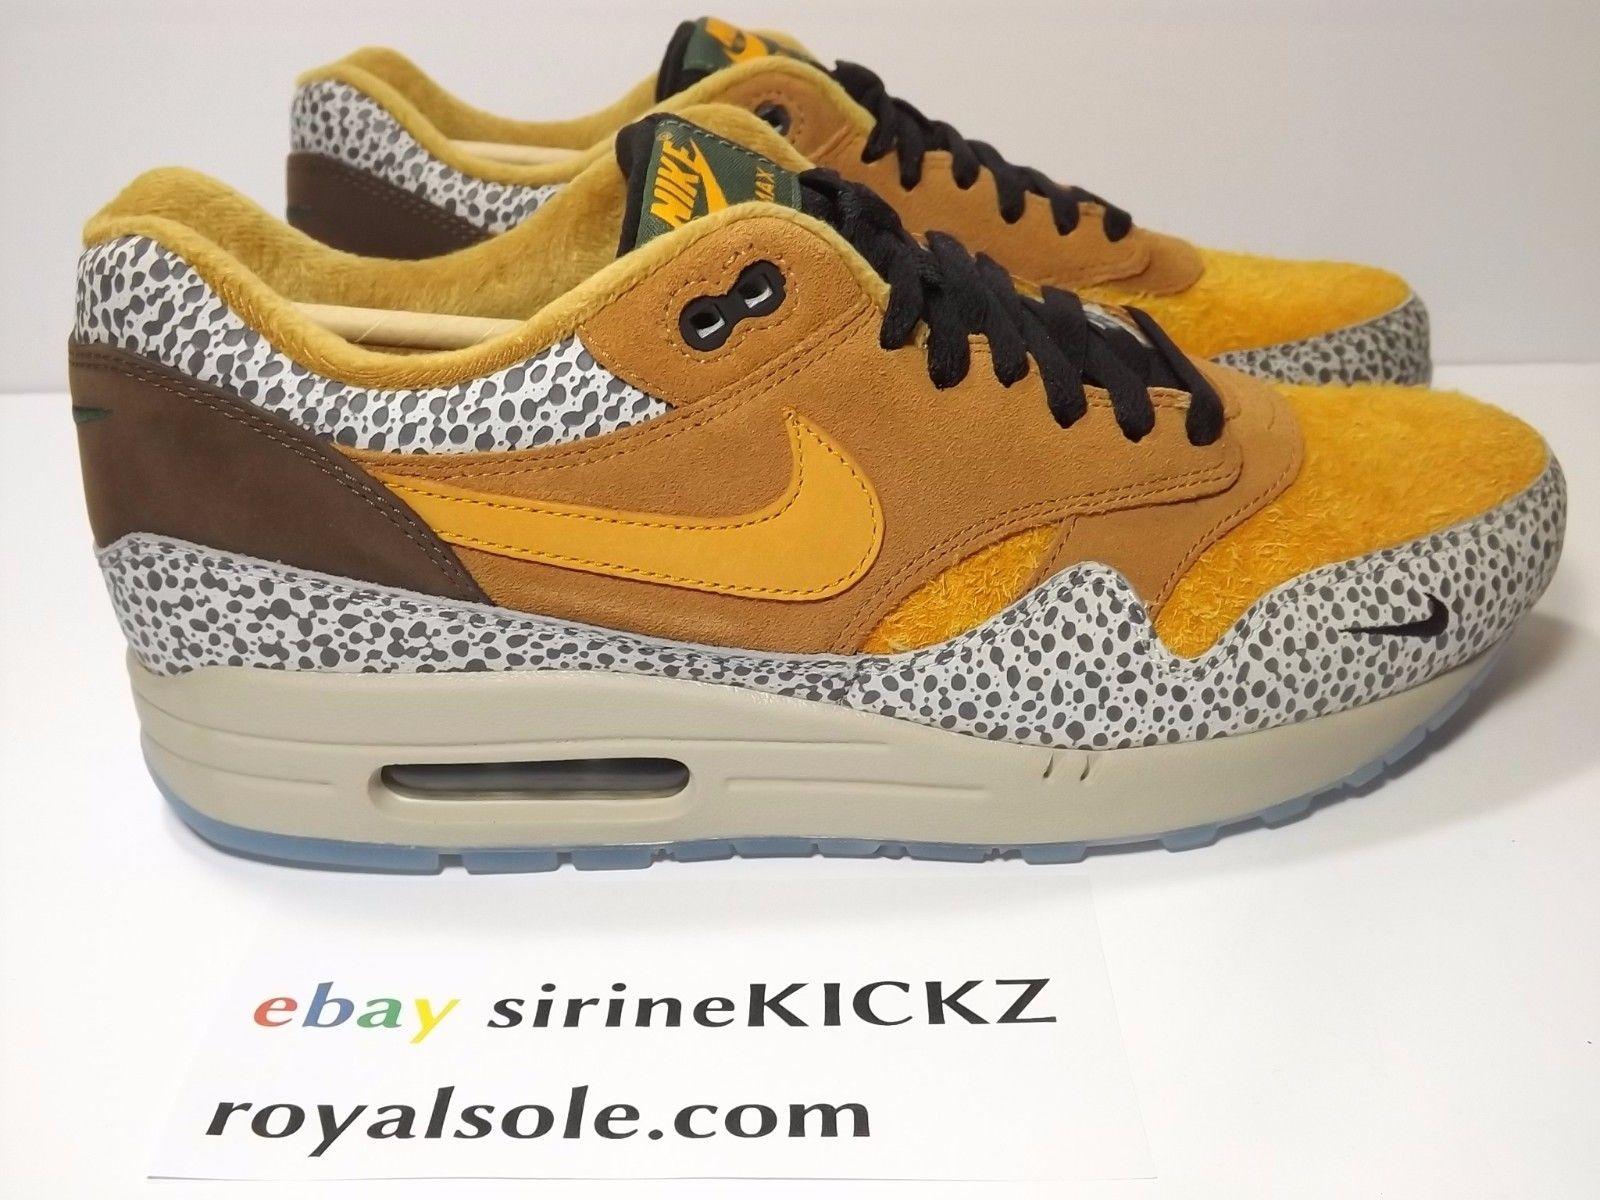 8d439068e72a ... uk image of nike air max 1 atmos safari premium qs flax kumquat  chestnut 665873 200